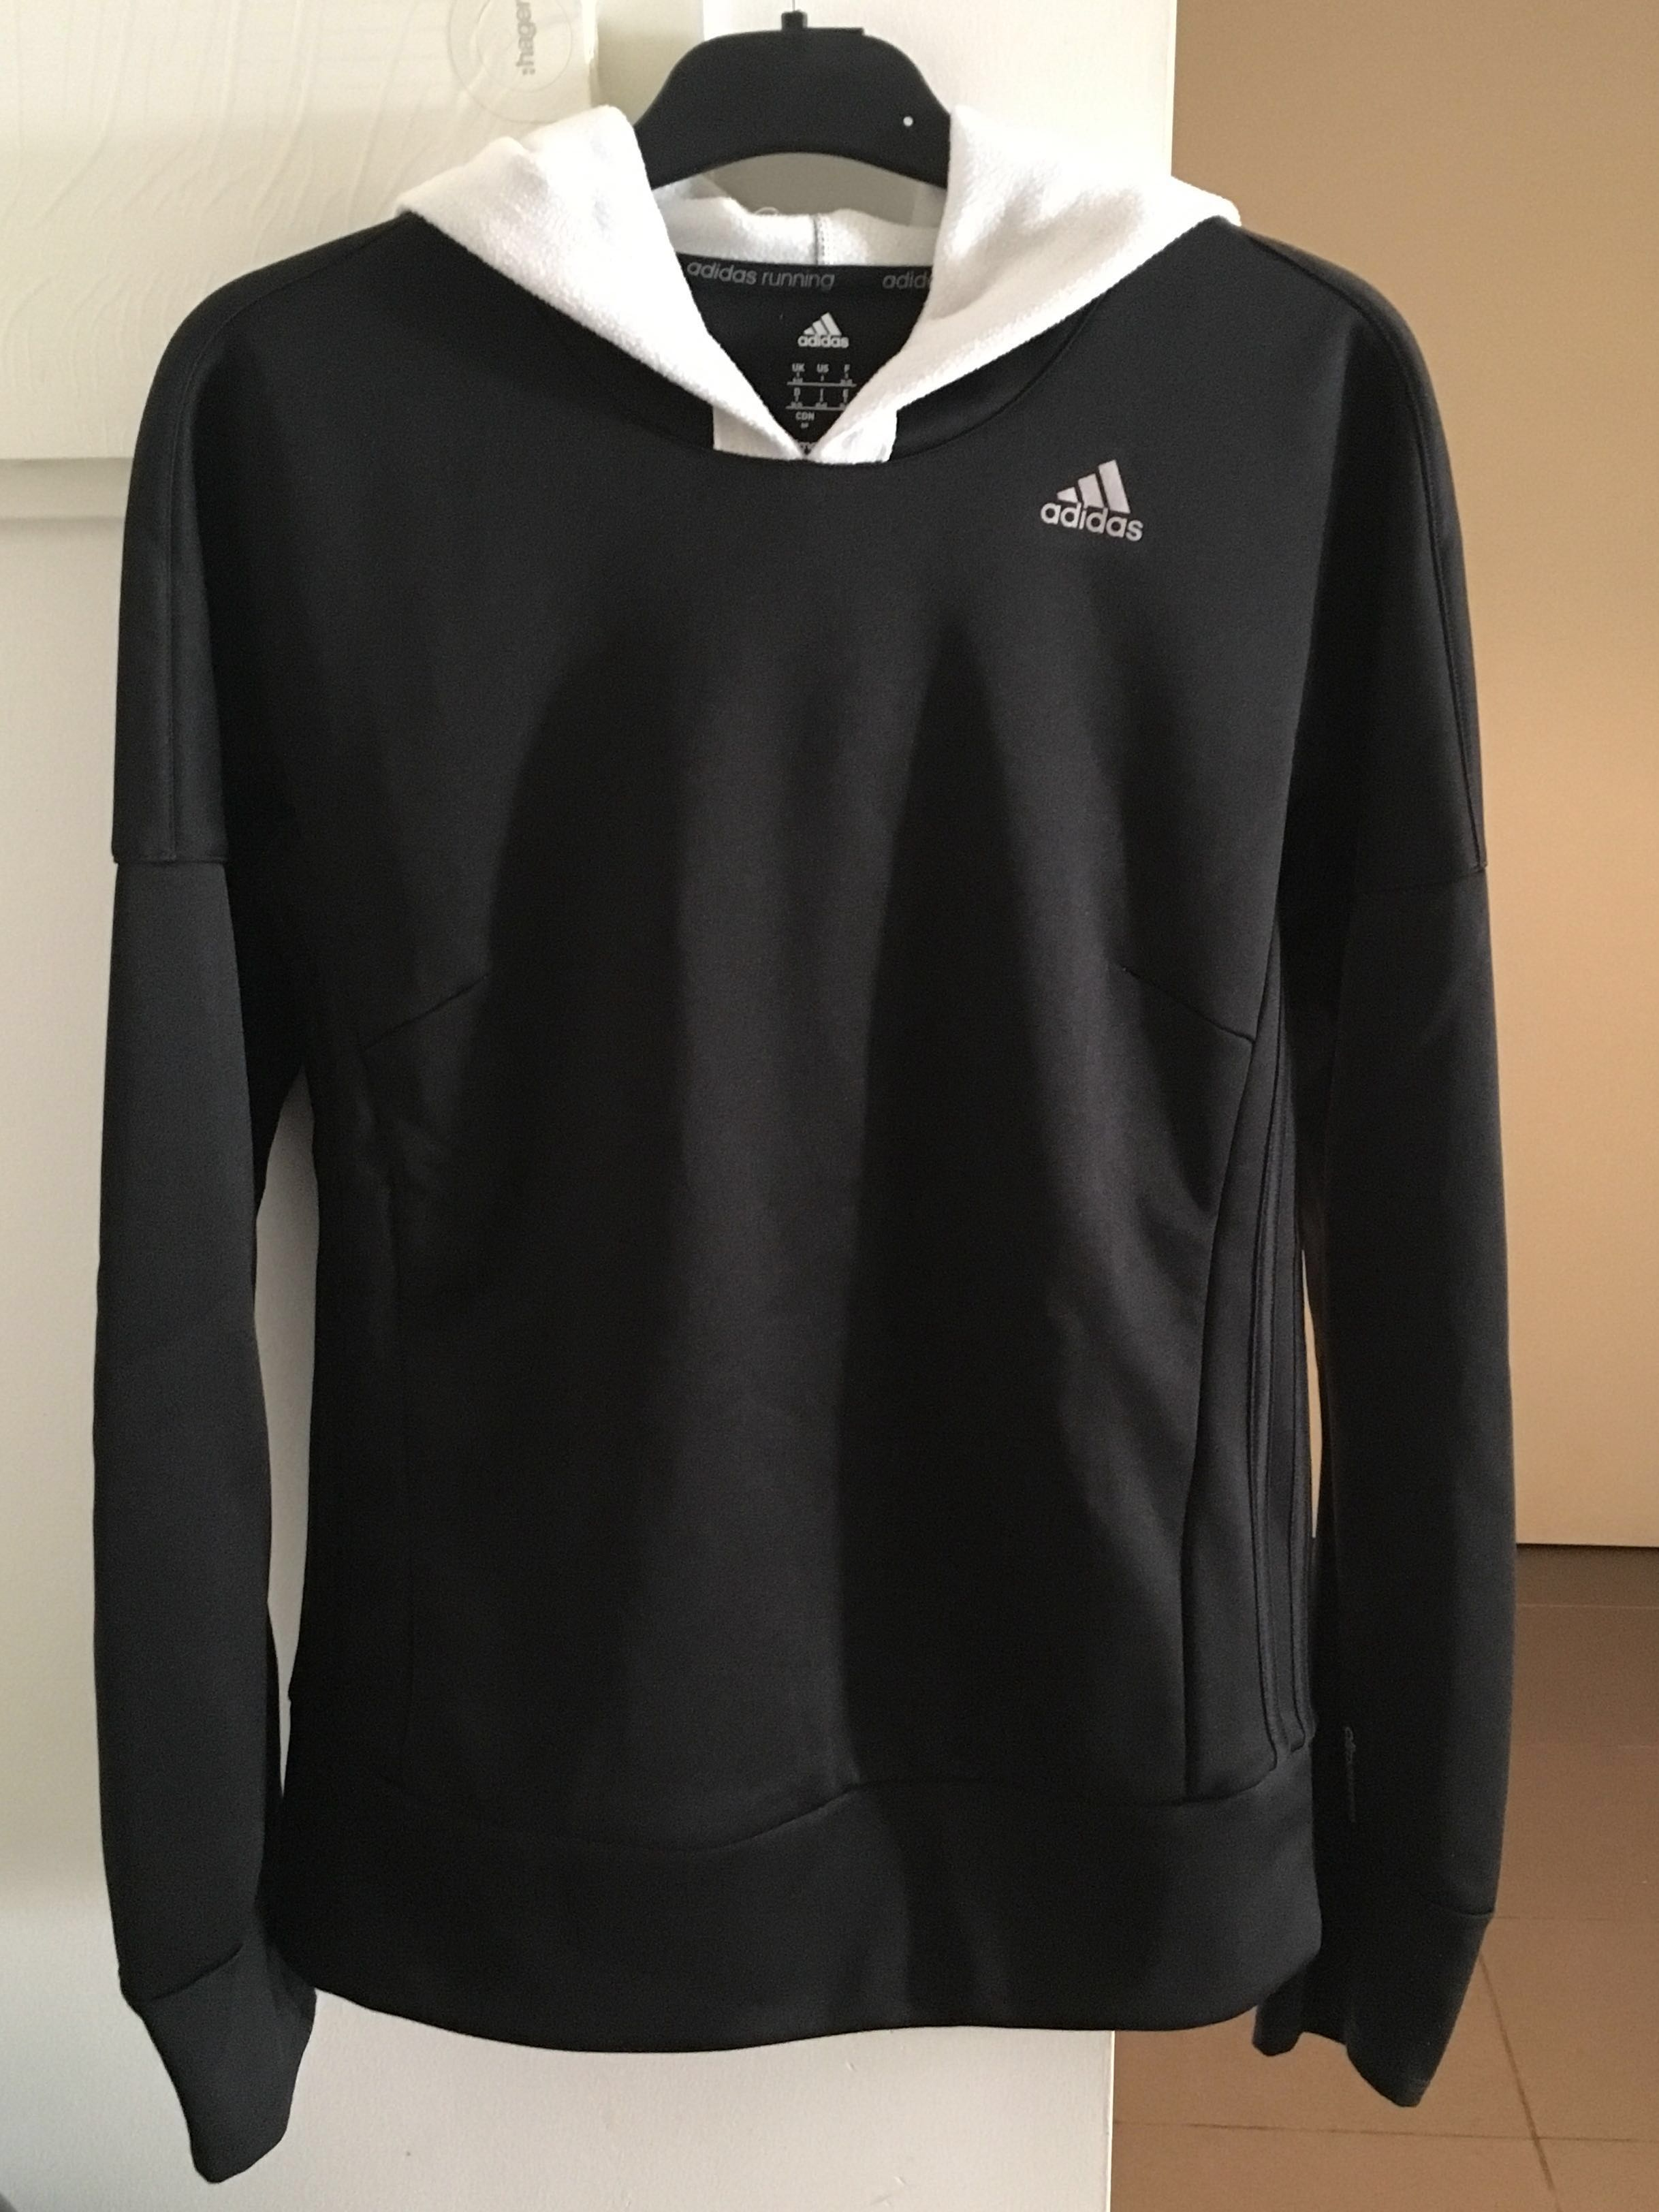 Adidas Running Climawarm Hoodie Black (S)